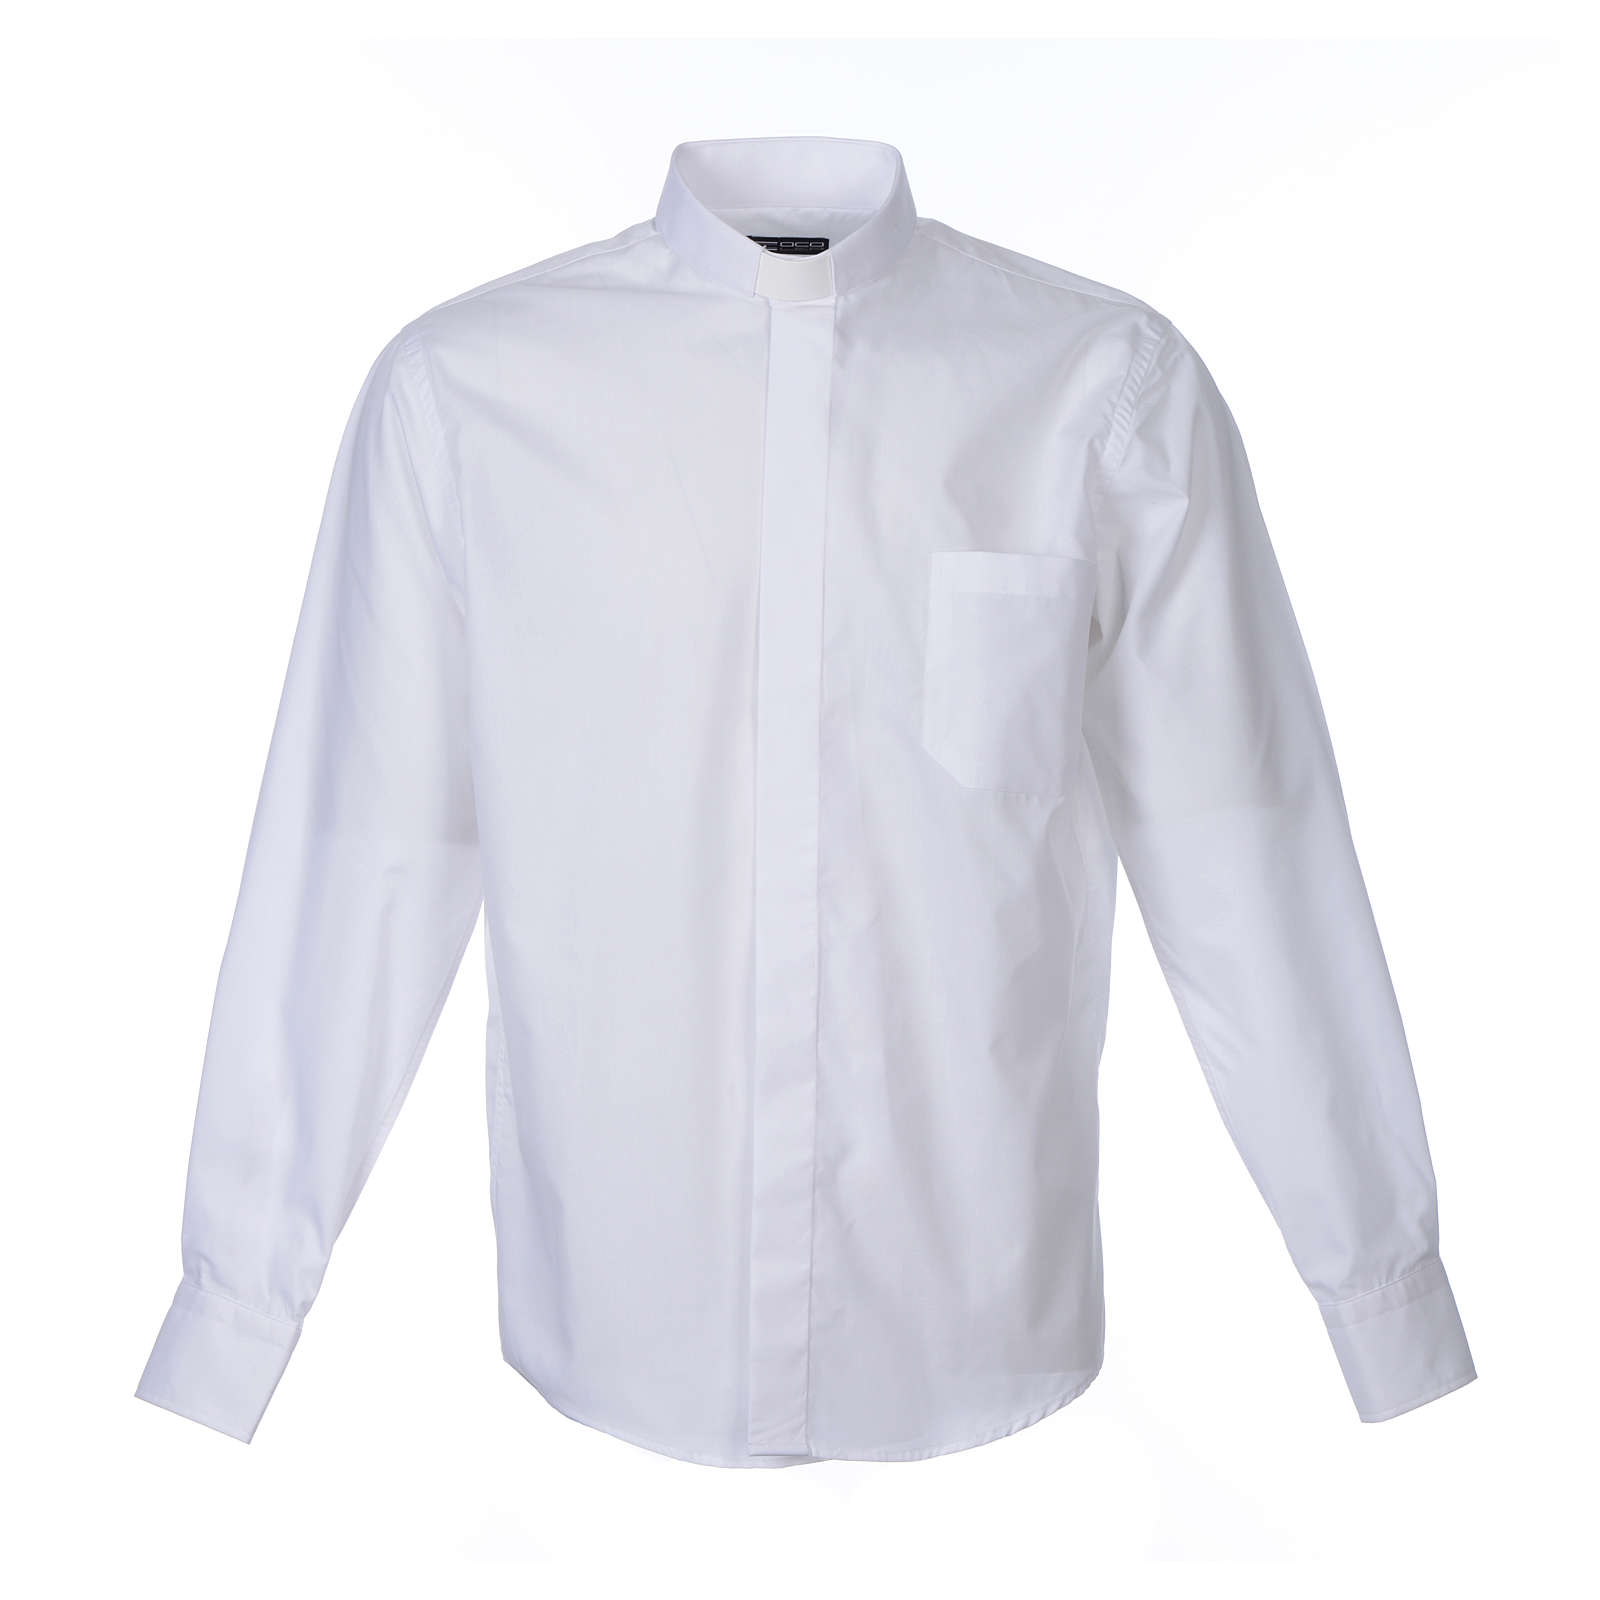 Camicia clergy M. Lunga tinta unita Misto cotone Bianco 4